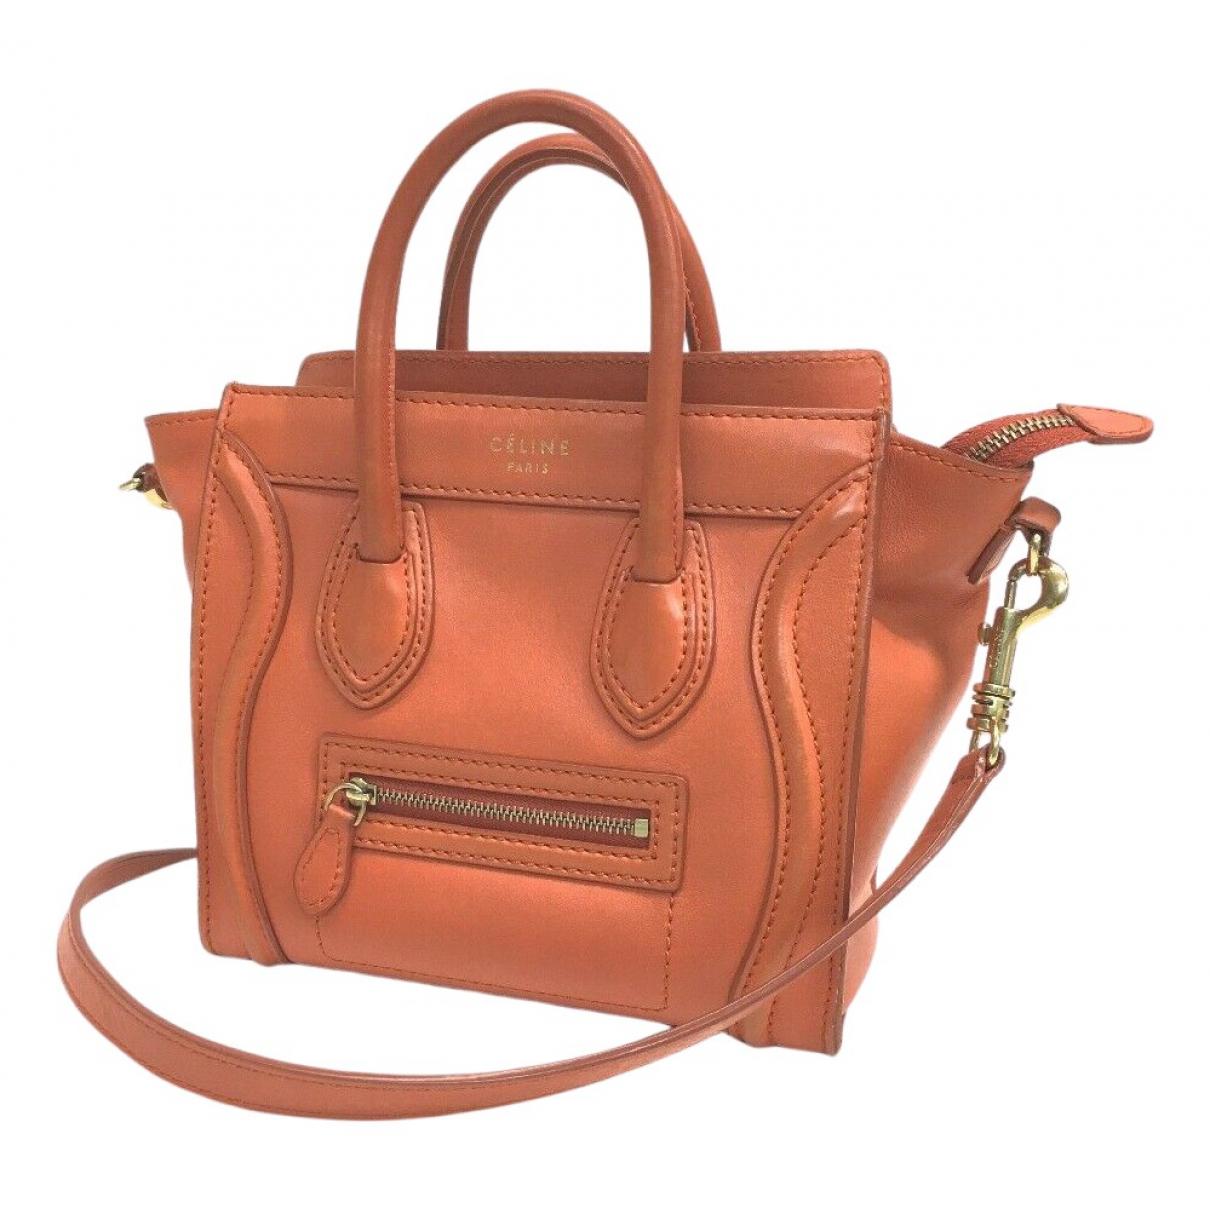 Celine Luggage Orange Leather handbag for Women N